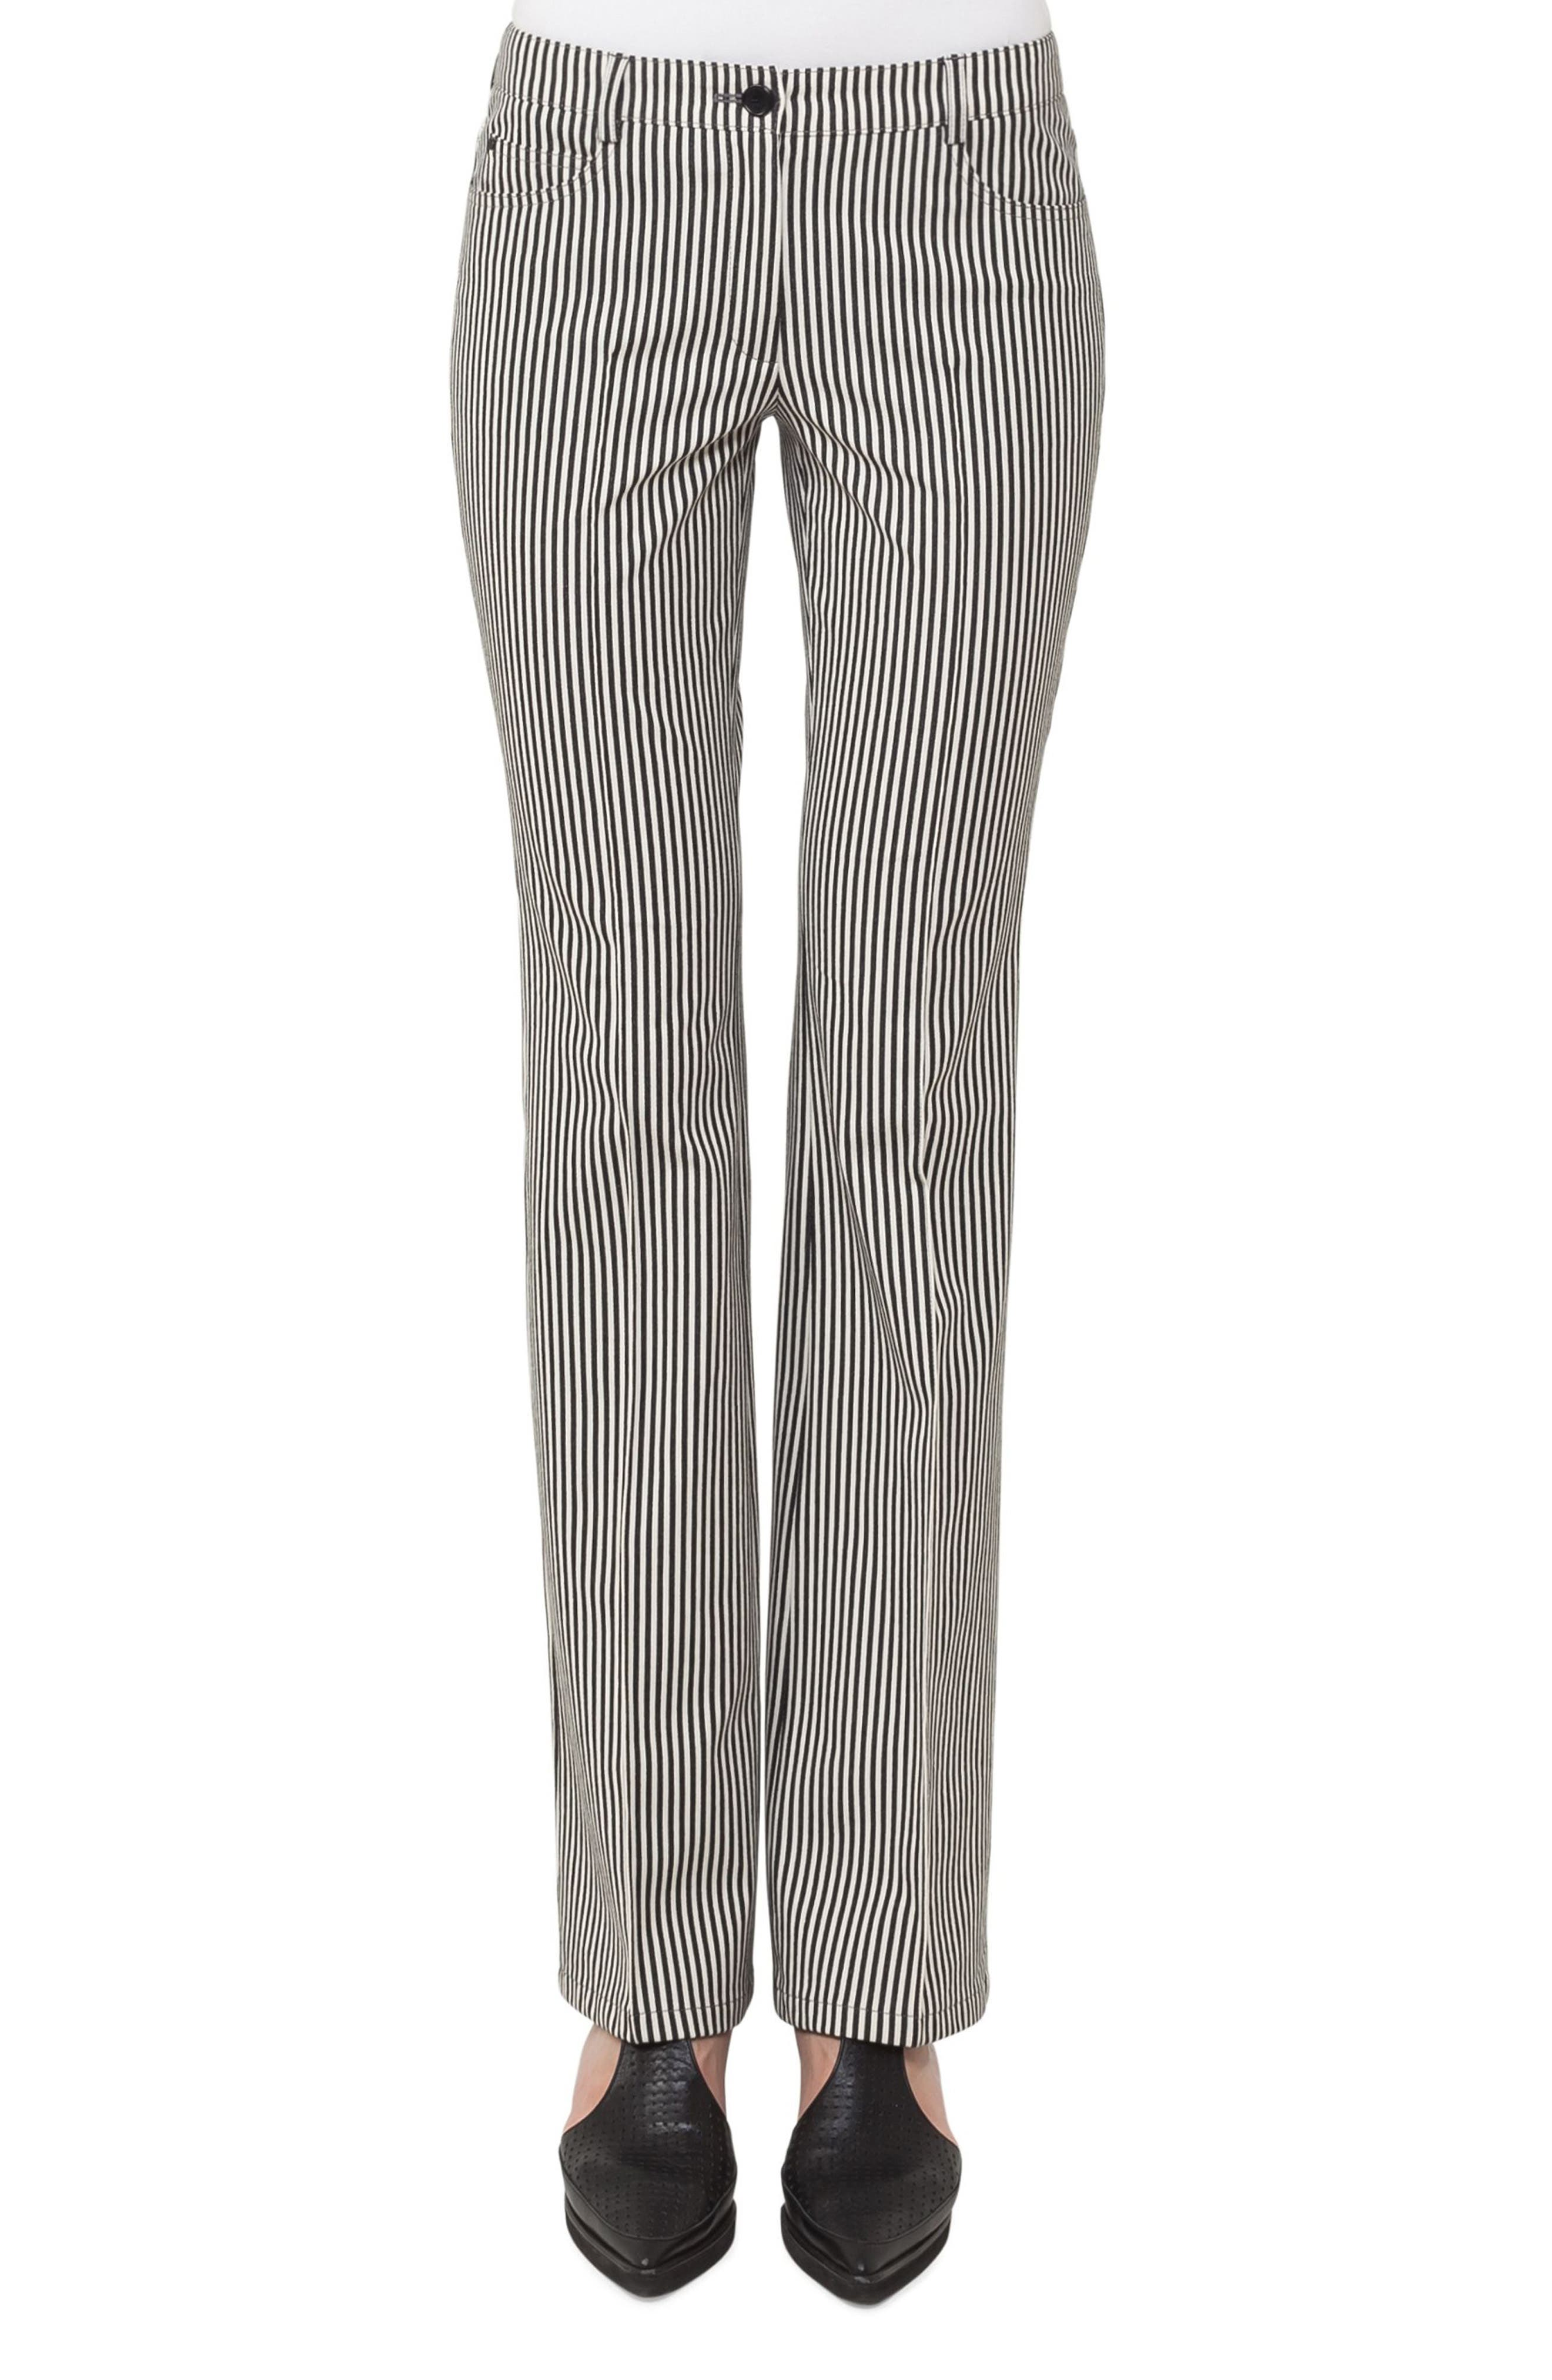 Faye Stripe Bootcut Pants,                         Main,                         color, Black/ Cream